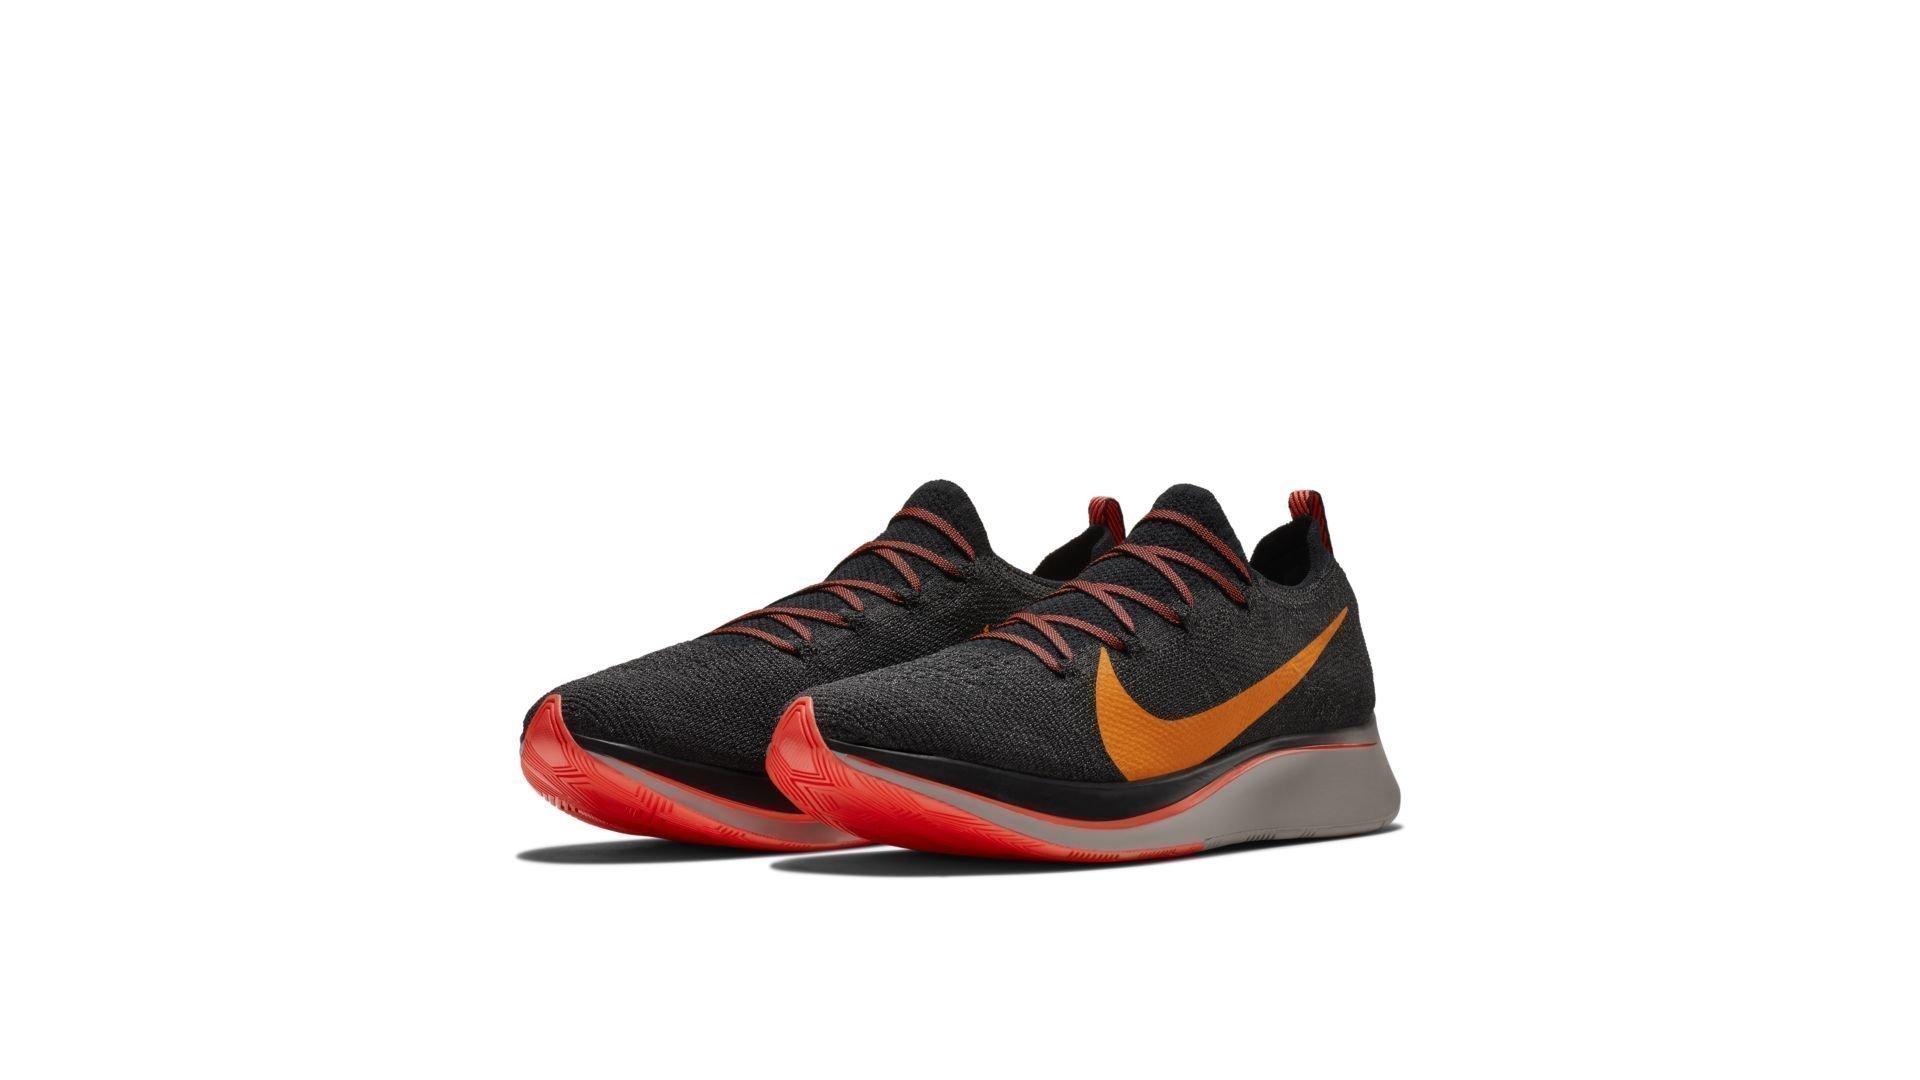 Nike Zoom Fly Flyknit Black Flash Crimson (AR4561-068)